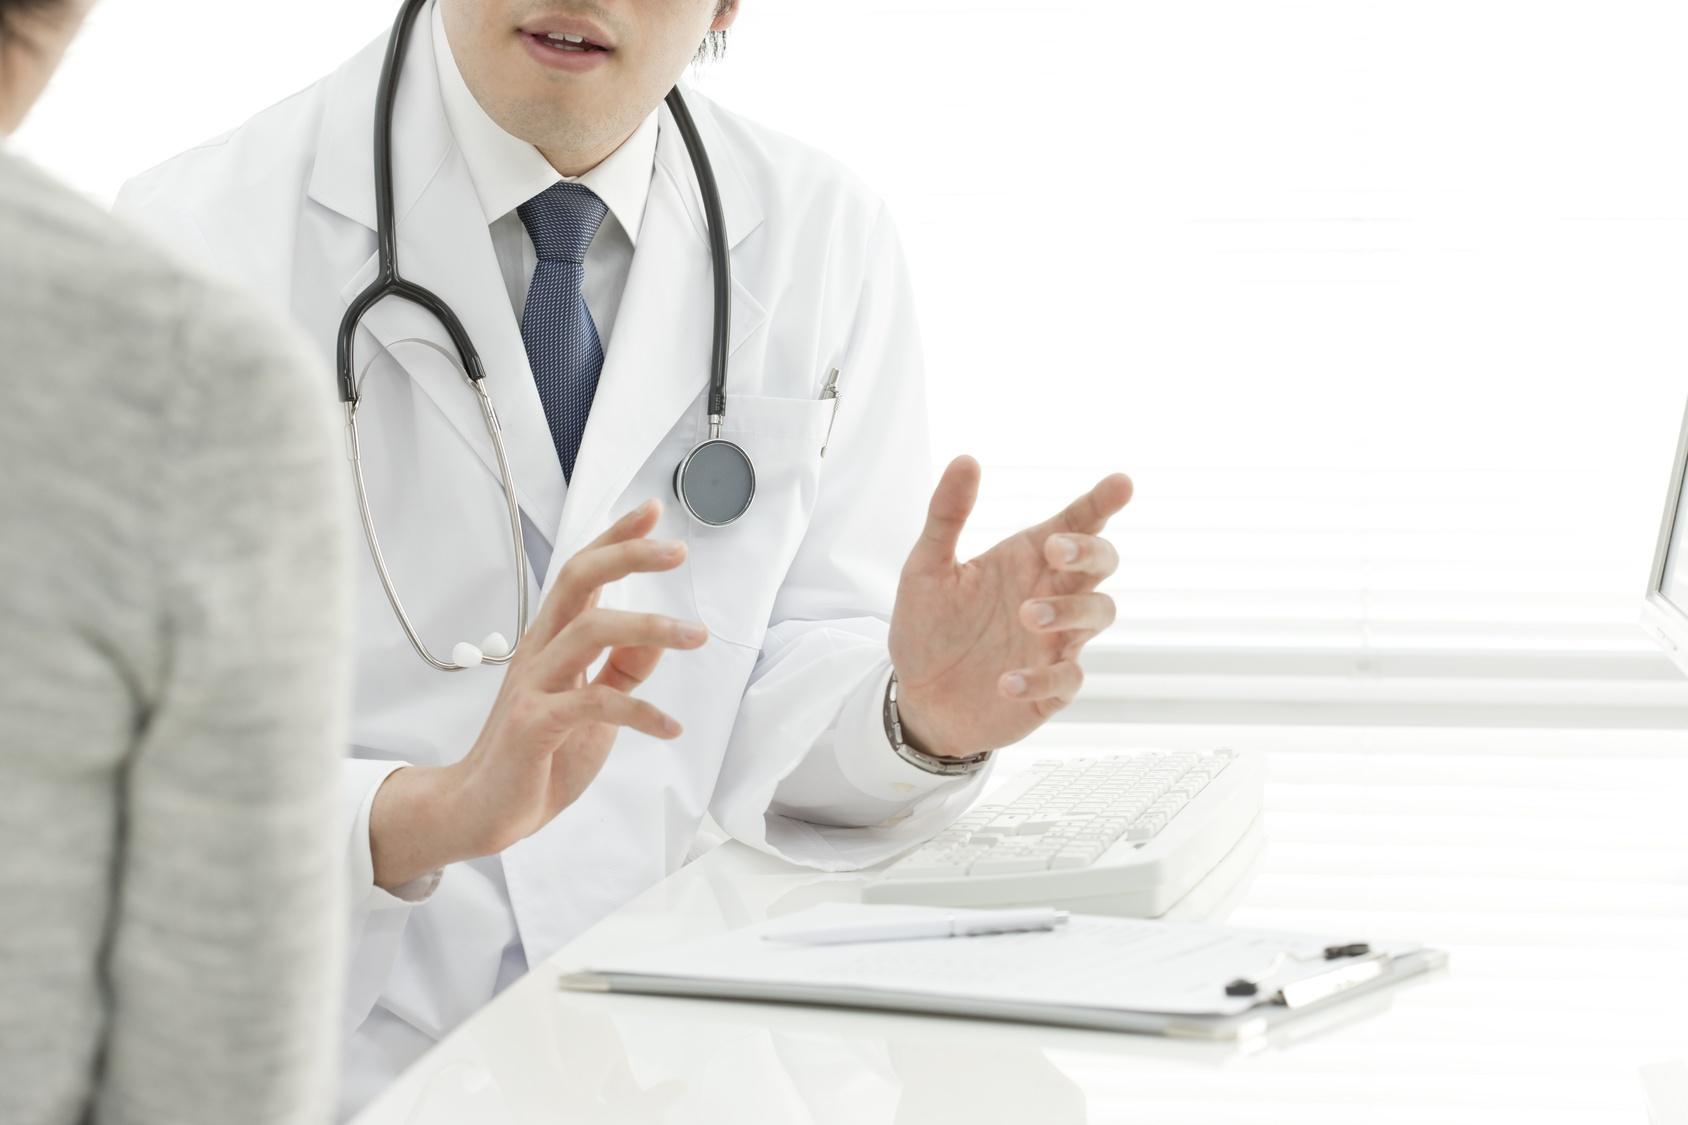 Thai doctor